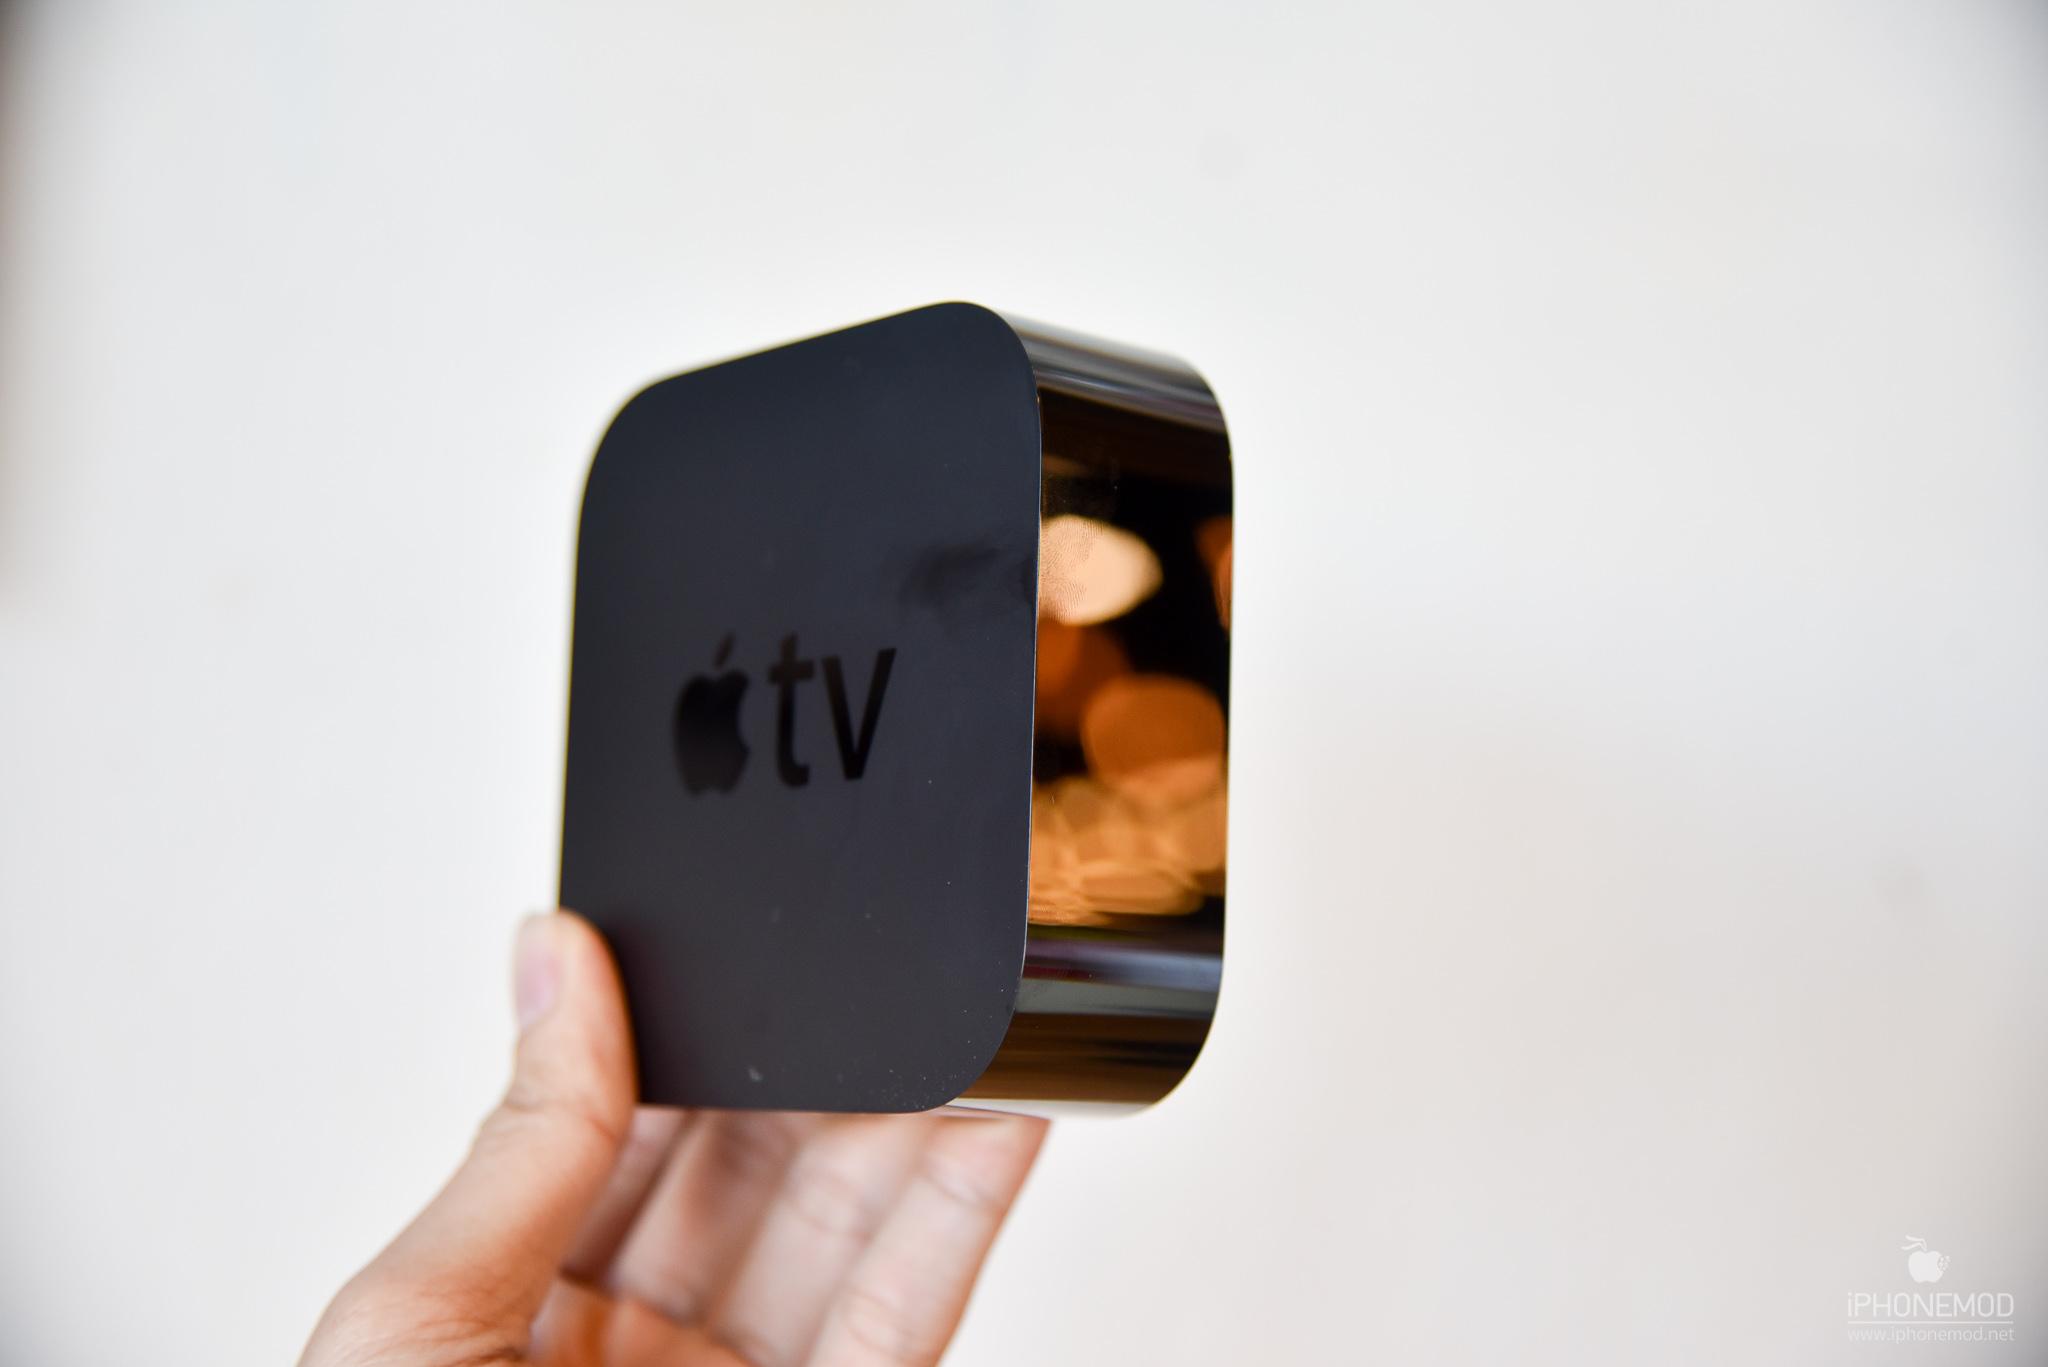 apple-tv4-unbox-hd-ep1-7